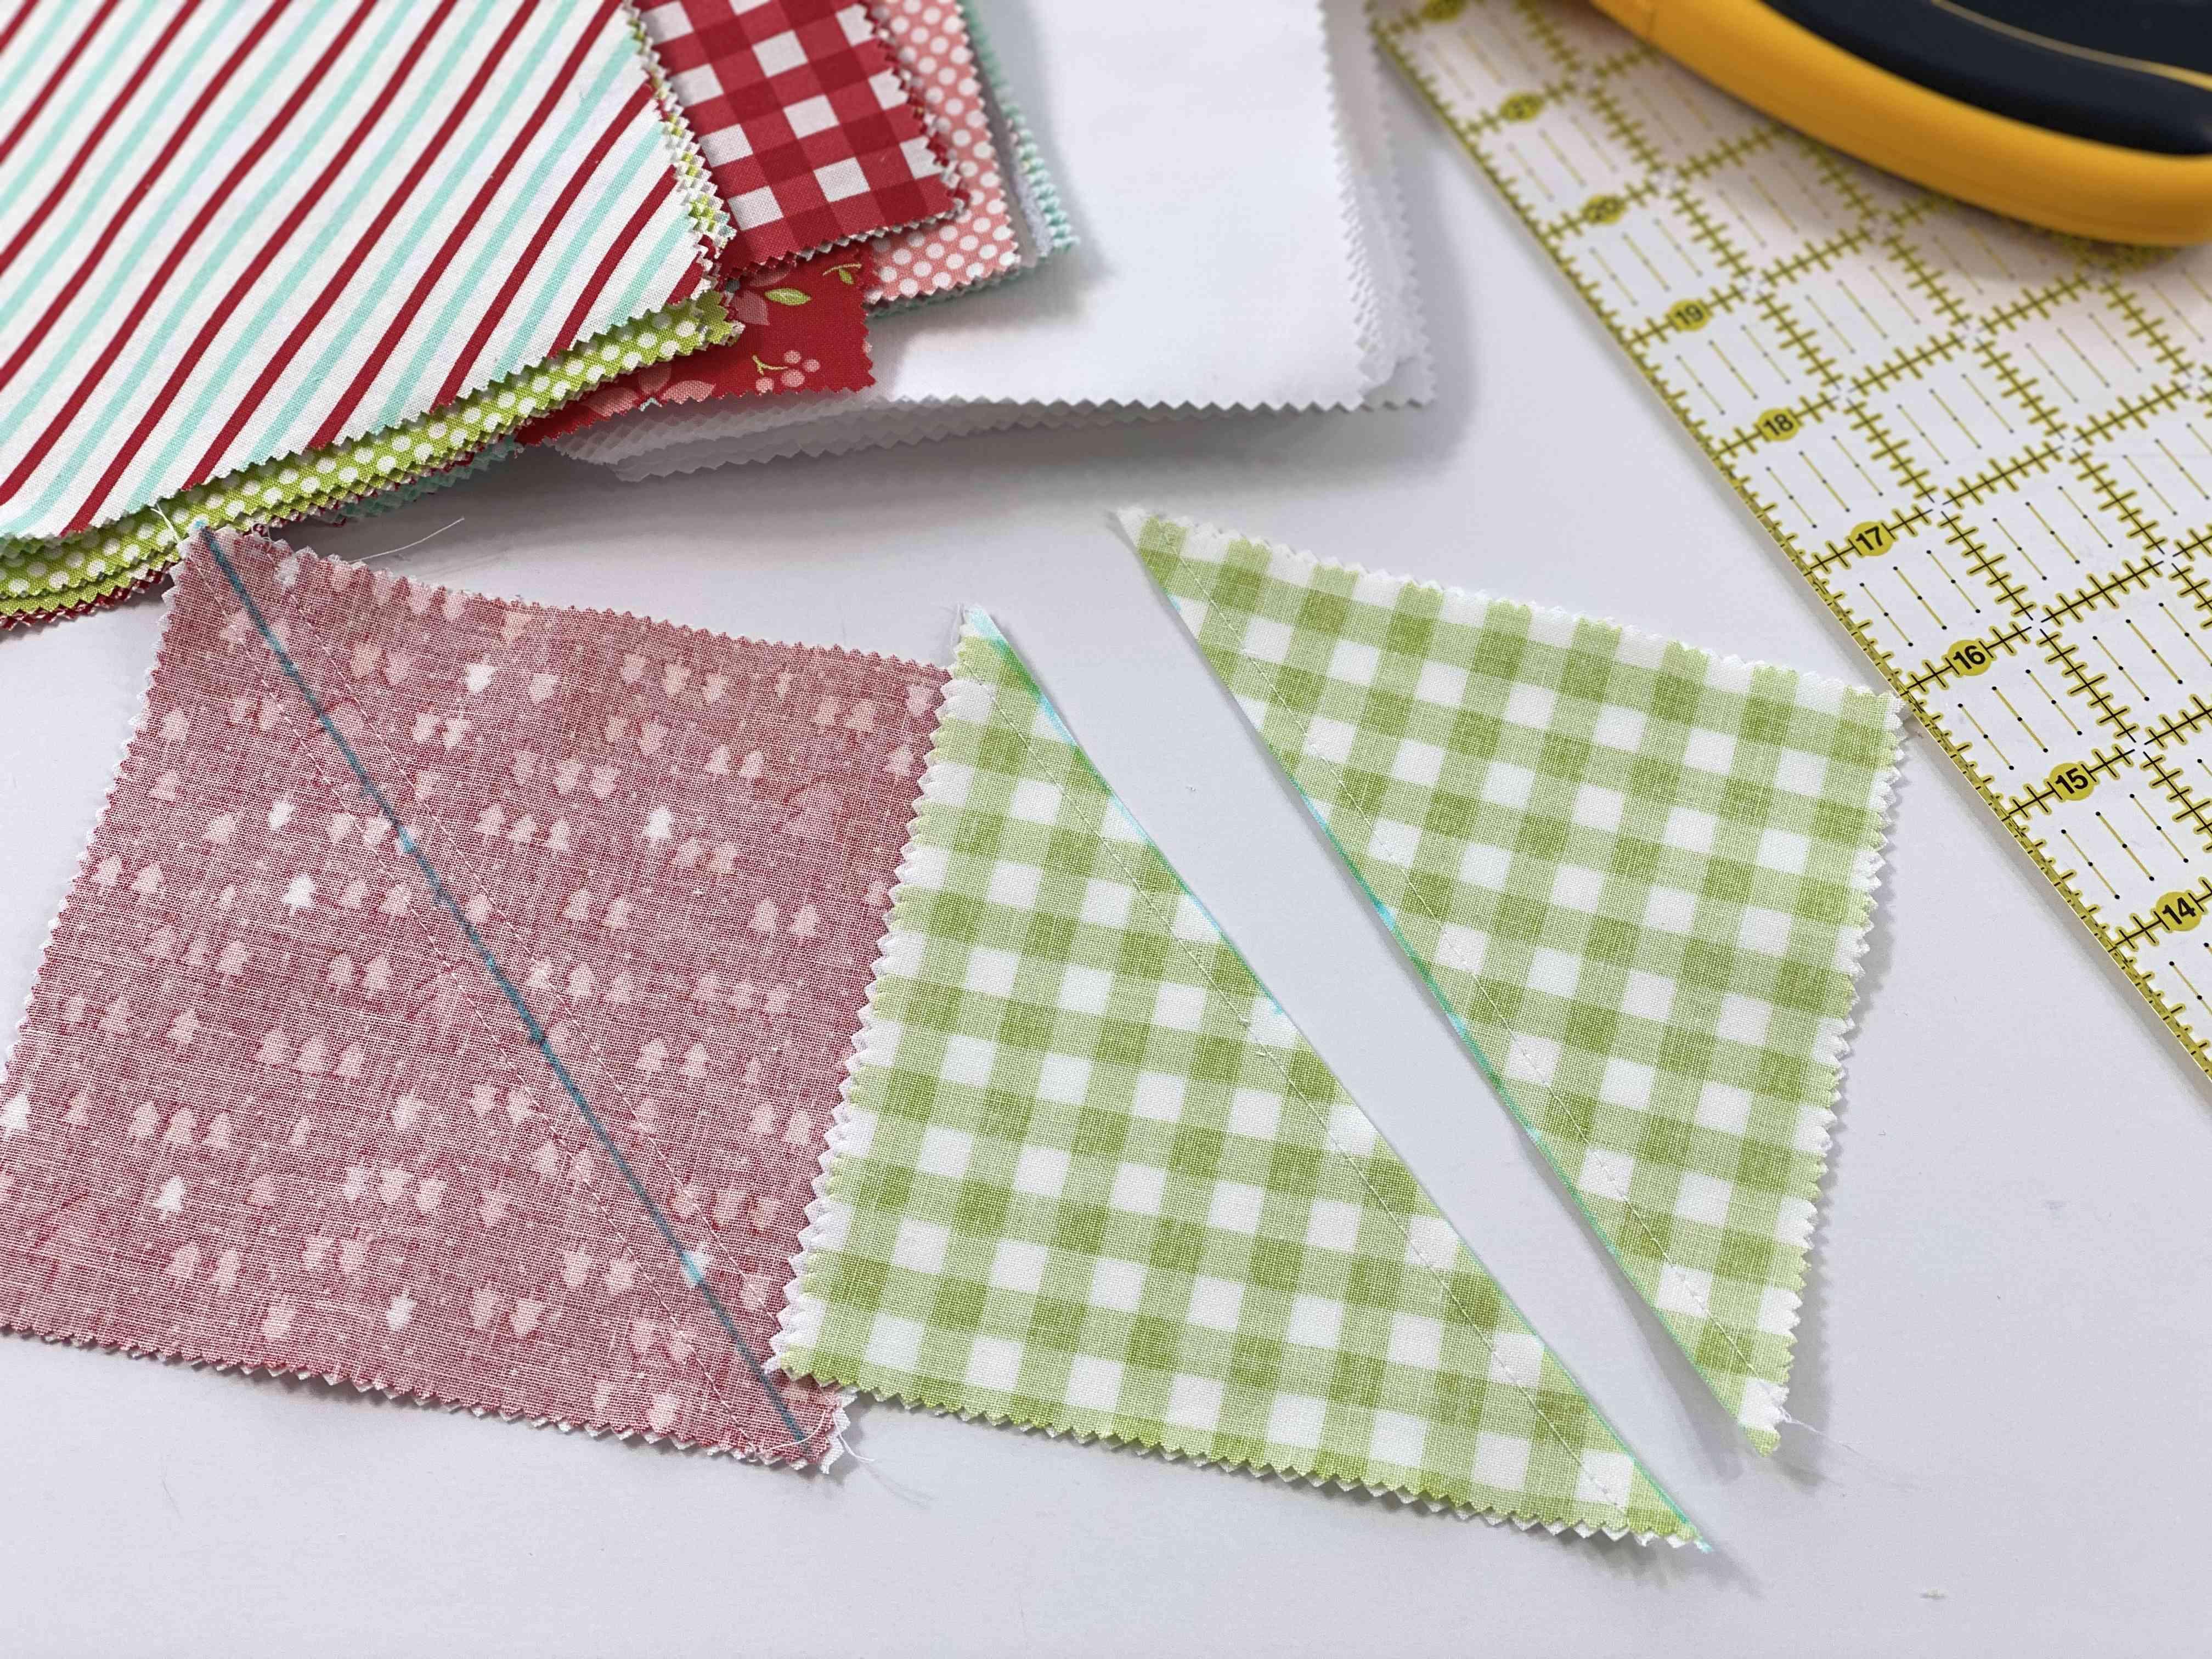 Cutting fabric to make half square triangles